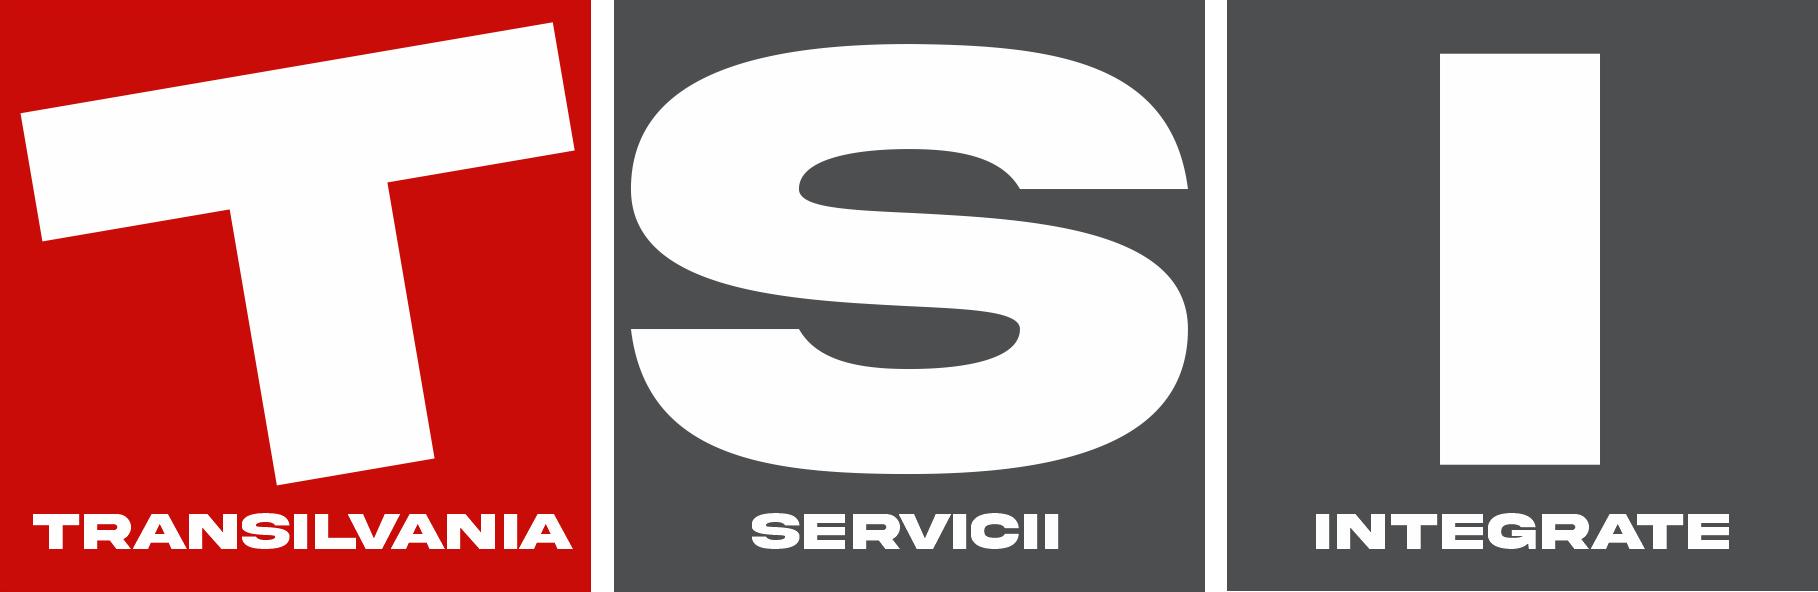 SERVICII DEZINFECTIE TRANSILVANIA SERVICII INTEGRATE